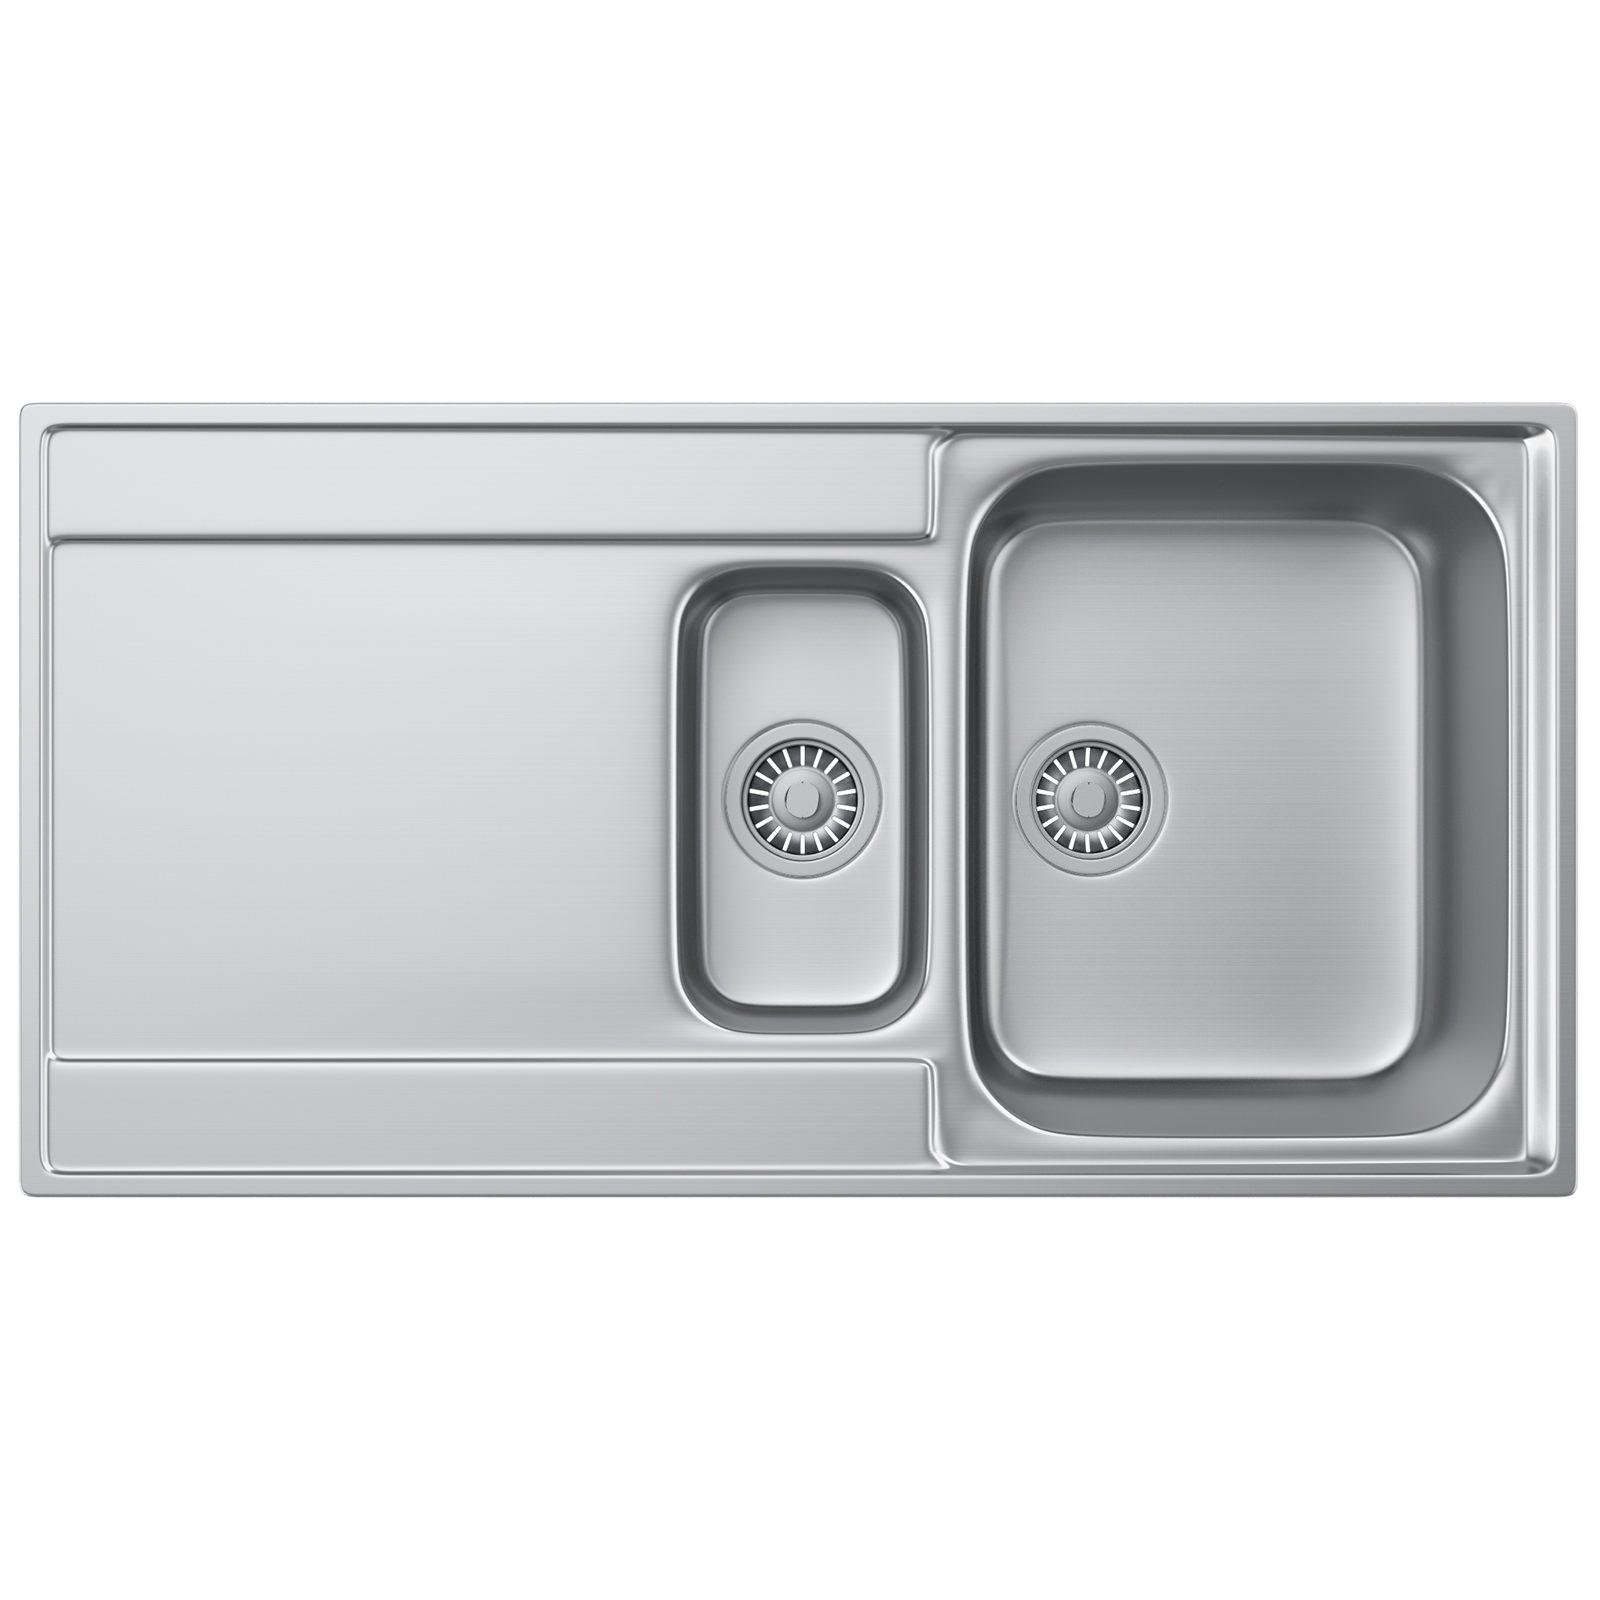 Franke Maris MRX 251 Slim-Top Stainless Steel LHD Inset Sink